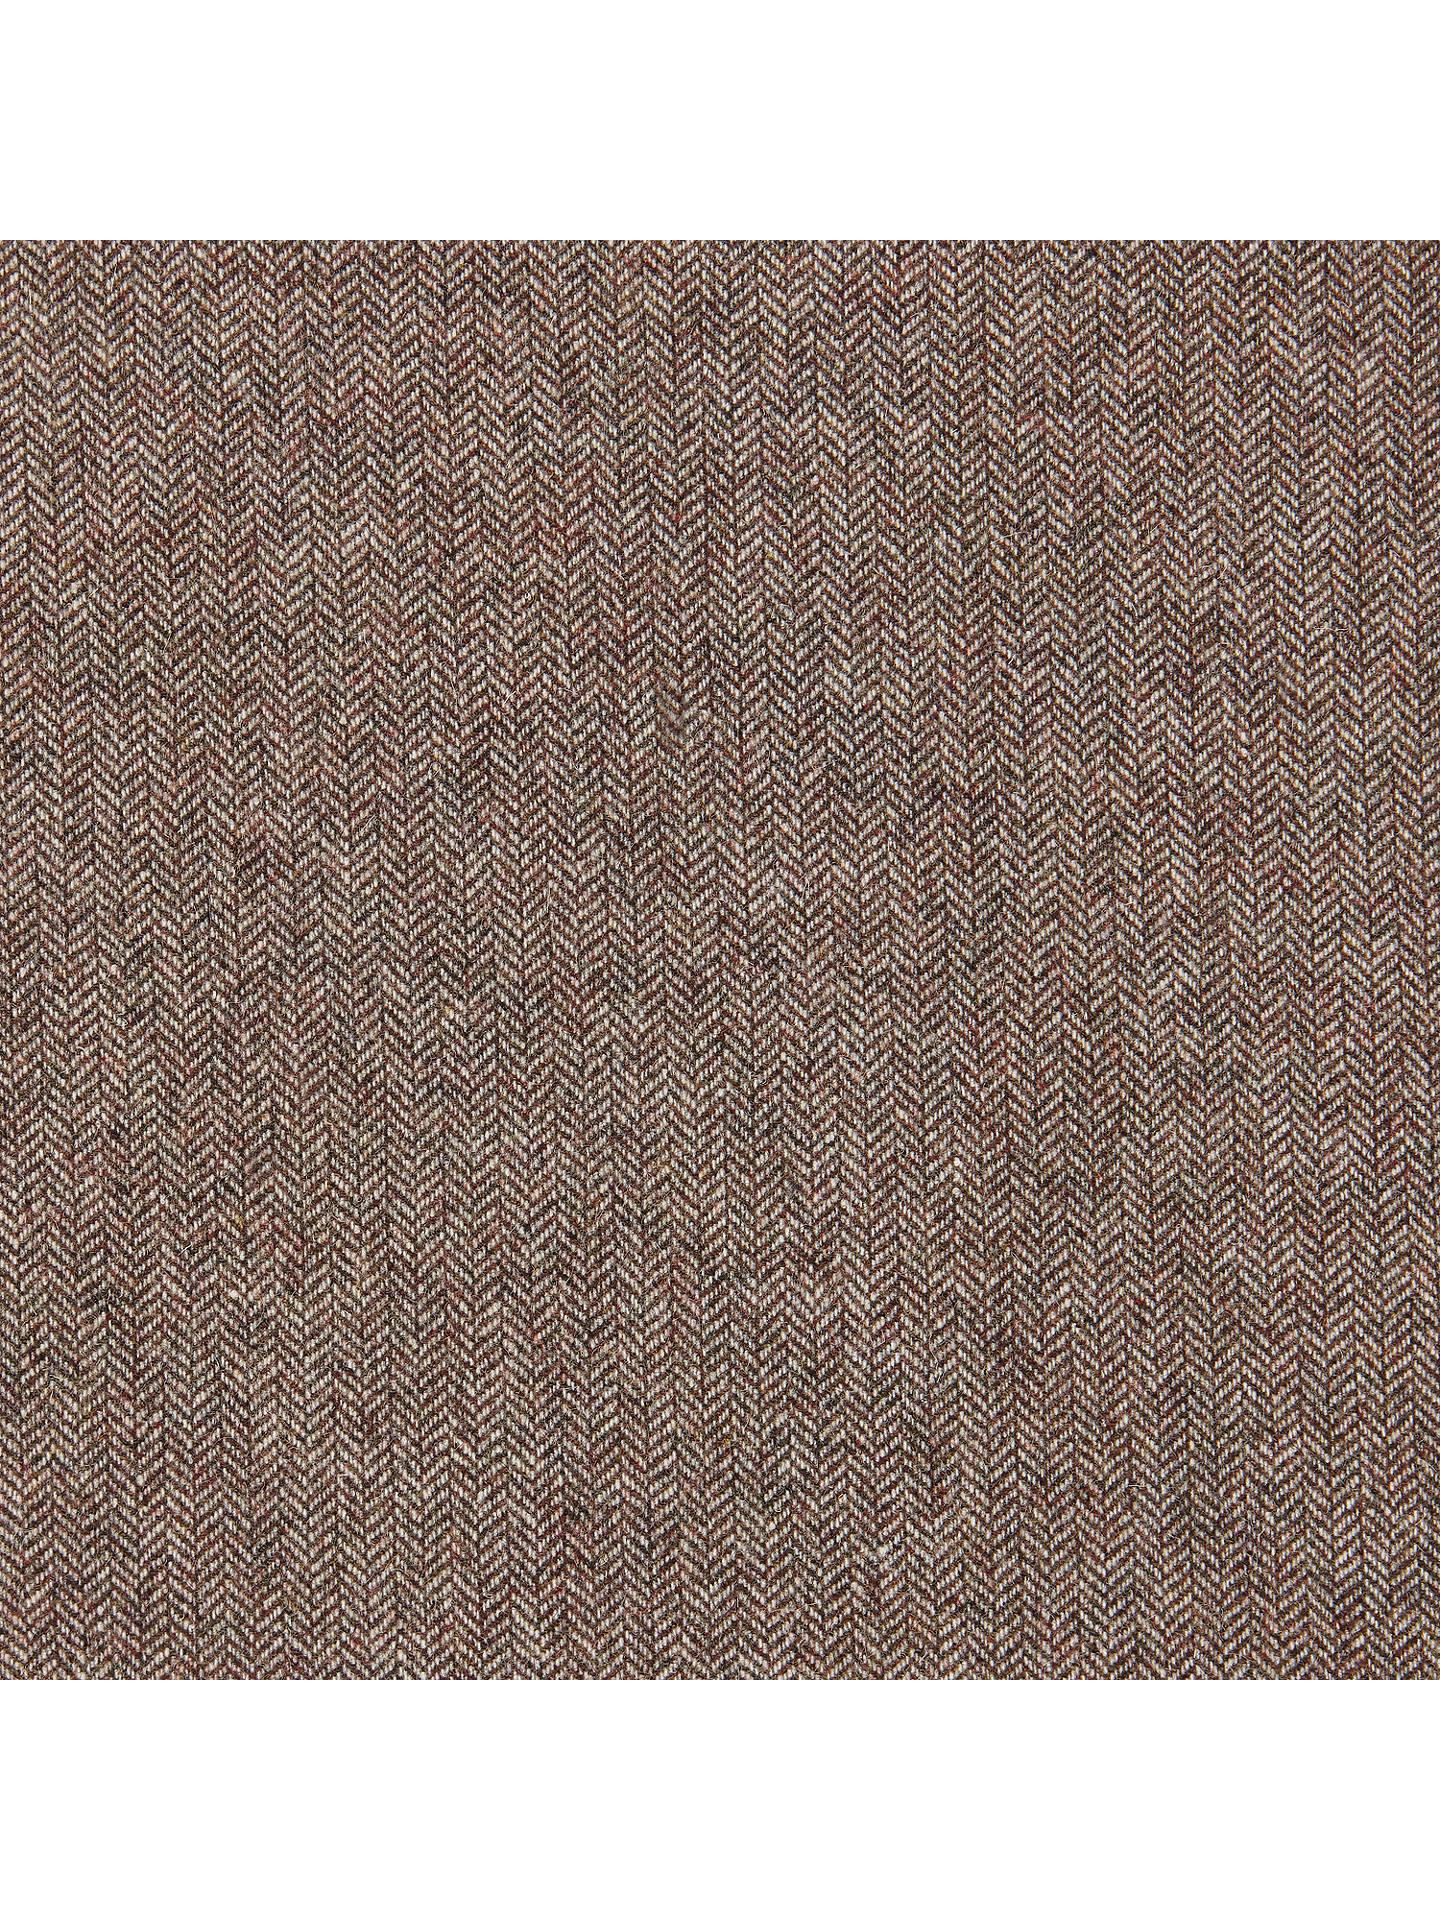 4137fe20de4c Buy Viscount Textiles Wool Suiting Herringbone Print Fabric